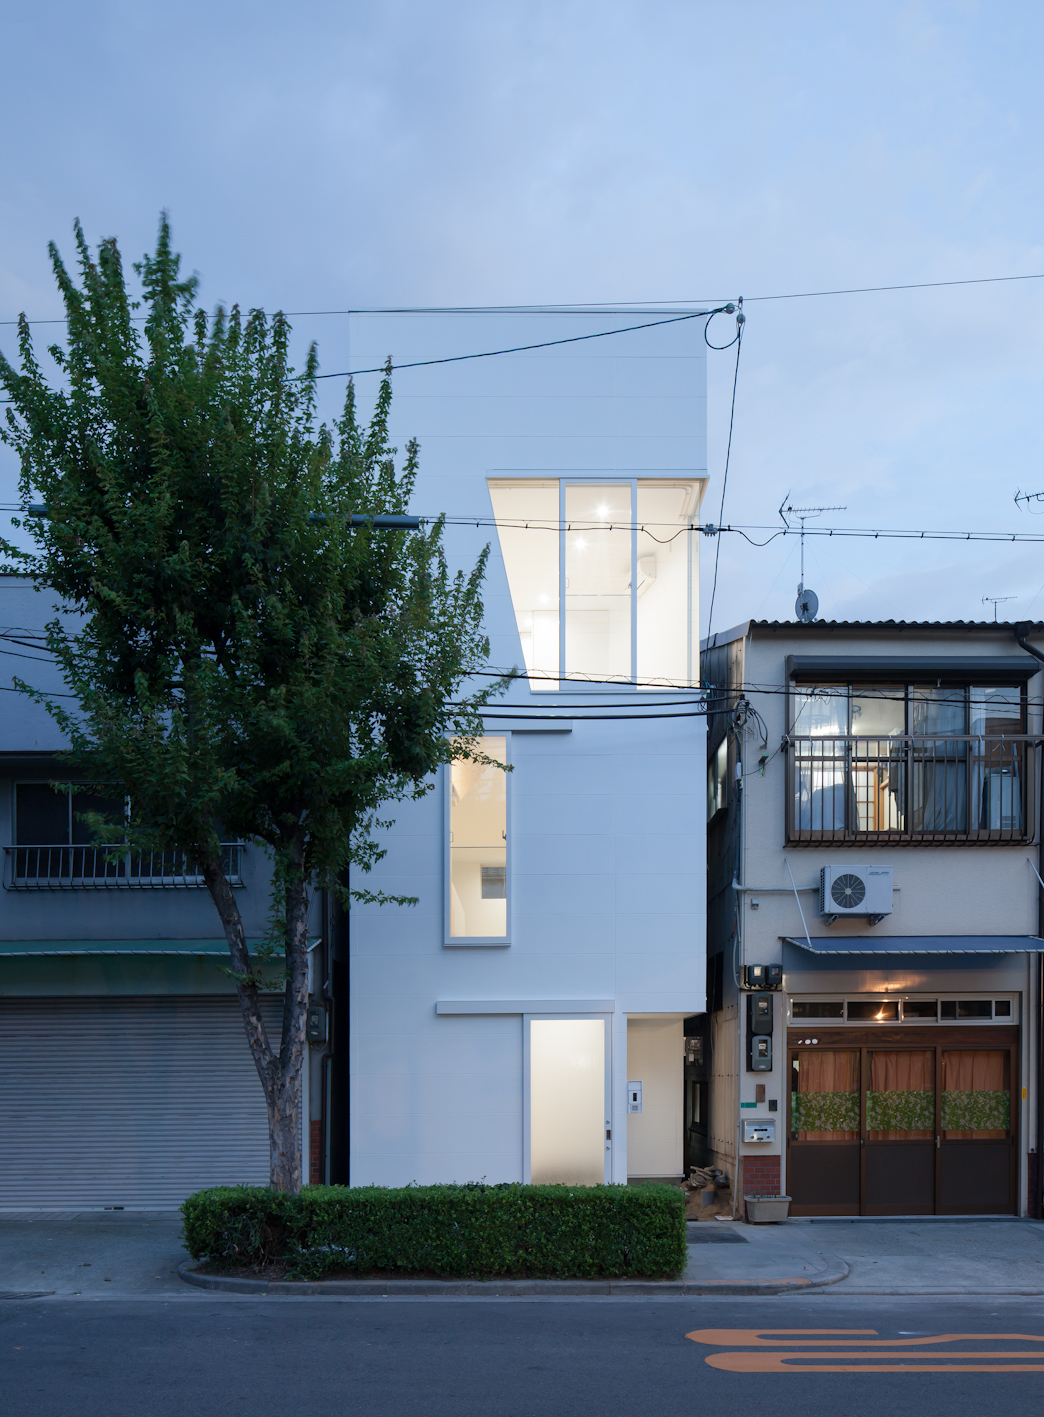 Casa en tamatsu ido kenji arquitectura y dise o los for Arquitectura y diseno de casas